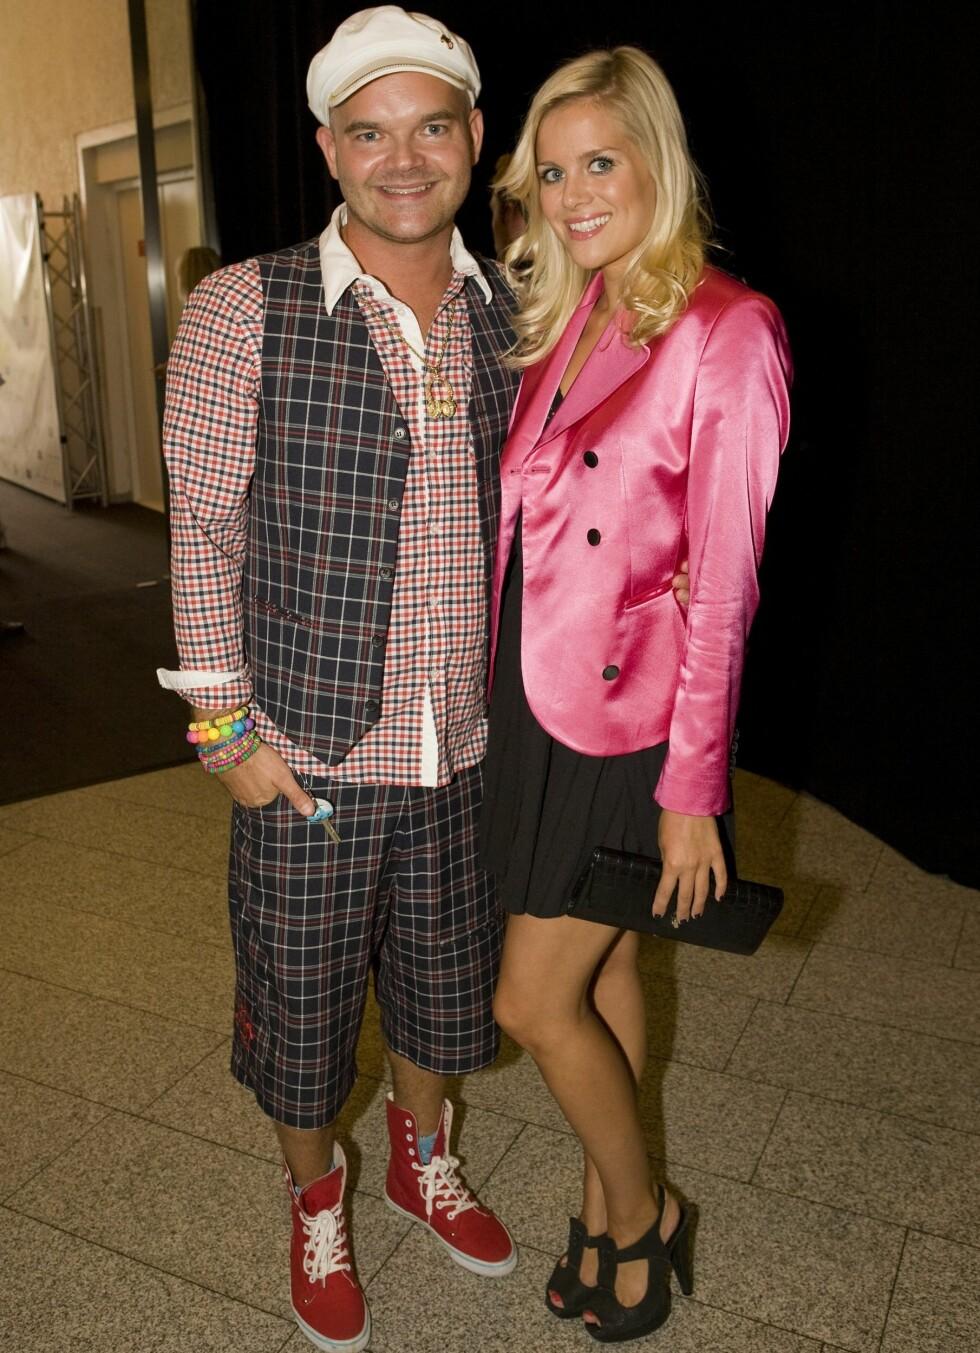 Moods of Norway-designer Simen Staalnacke sammen med kjæresten. Han kledd i eget design, hun i en rosa jakke fra Moods of Norway, sko fra Top Shop og vintage-kjole.